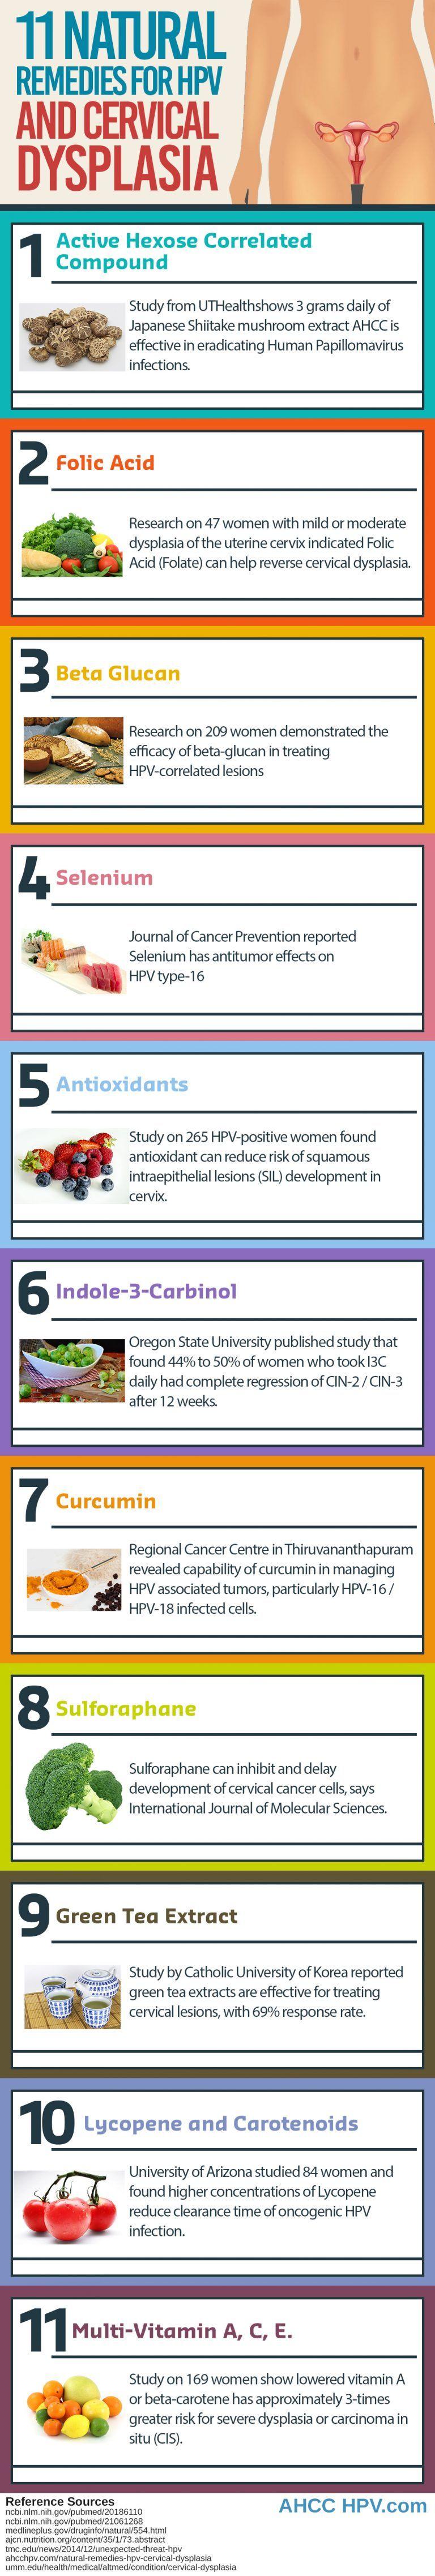 hpv natural treatment vitamins)